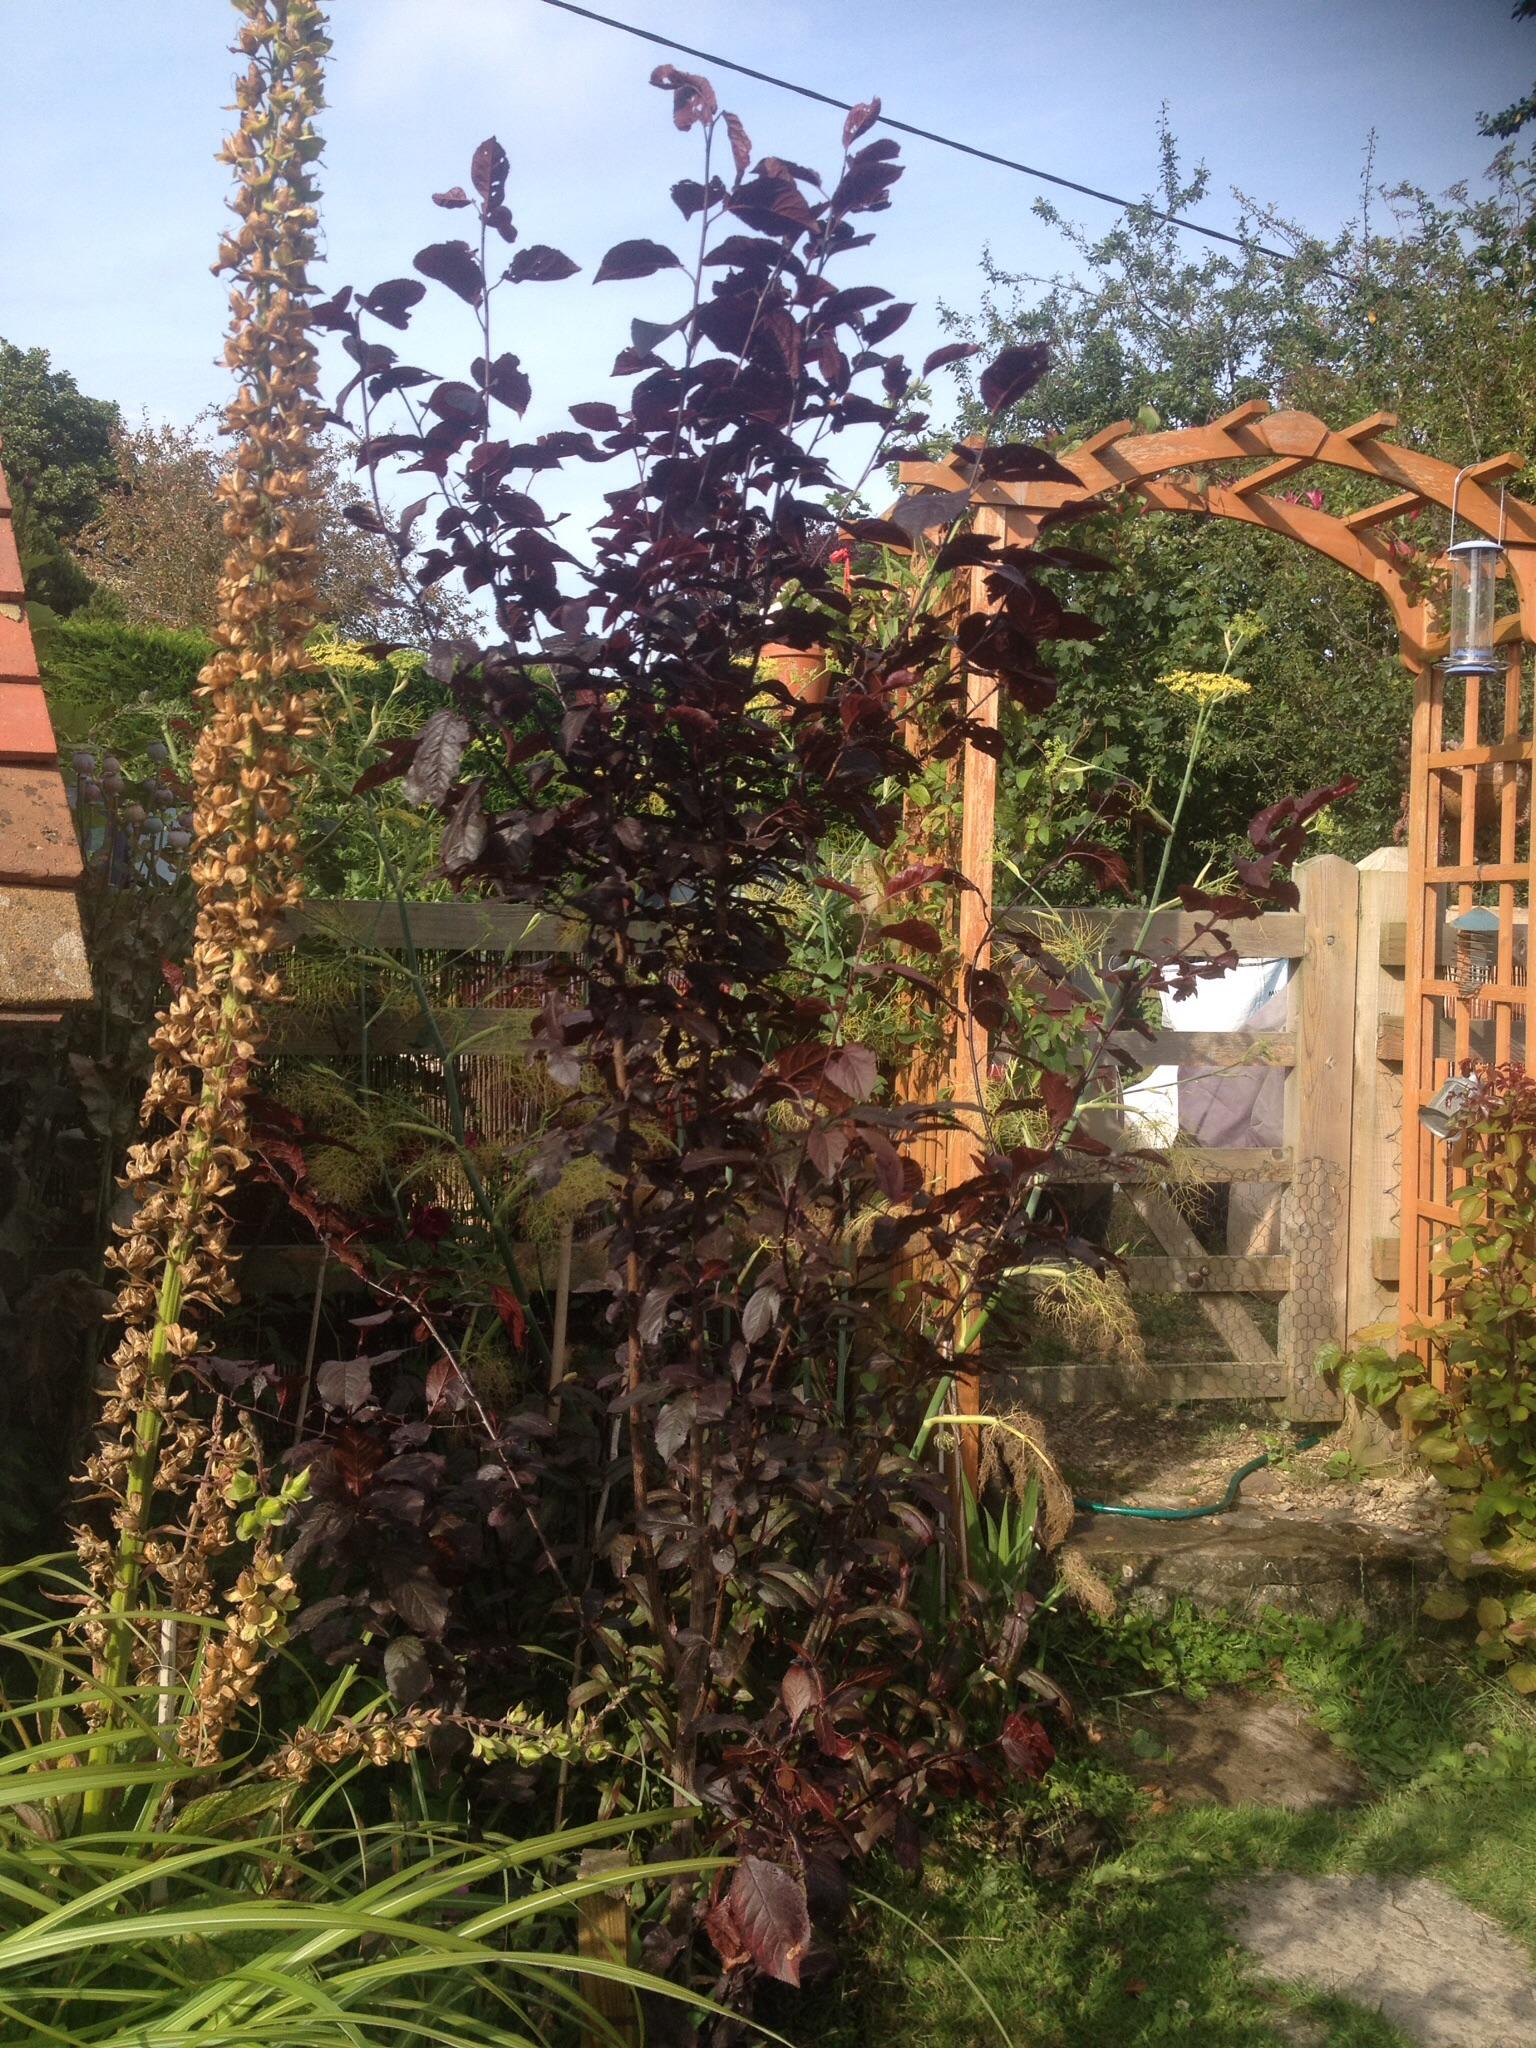 Prunus Nigra new to the garden